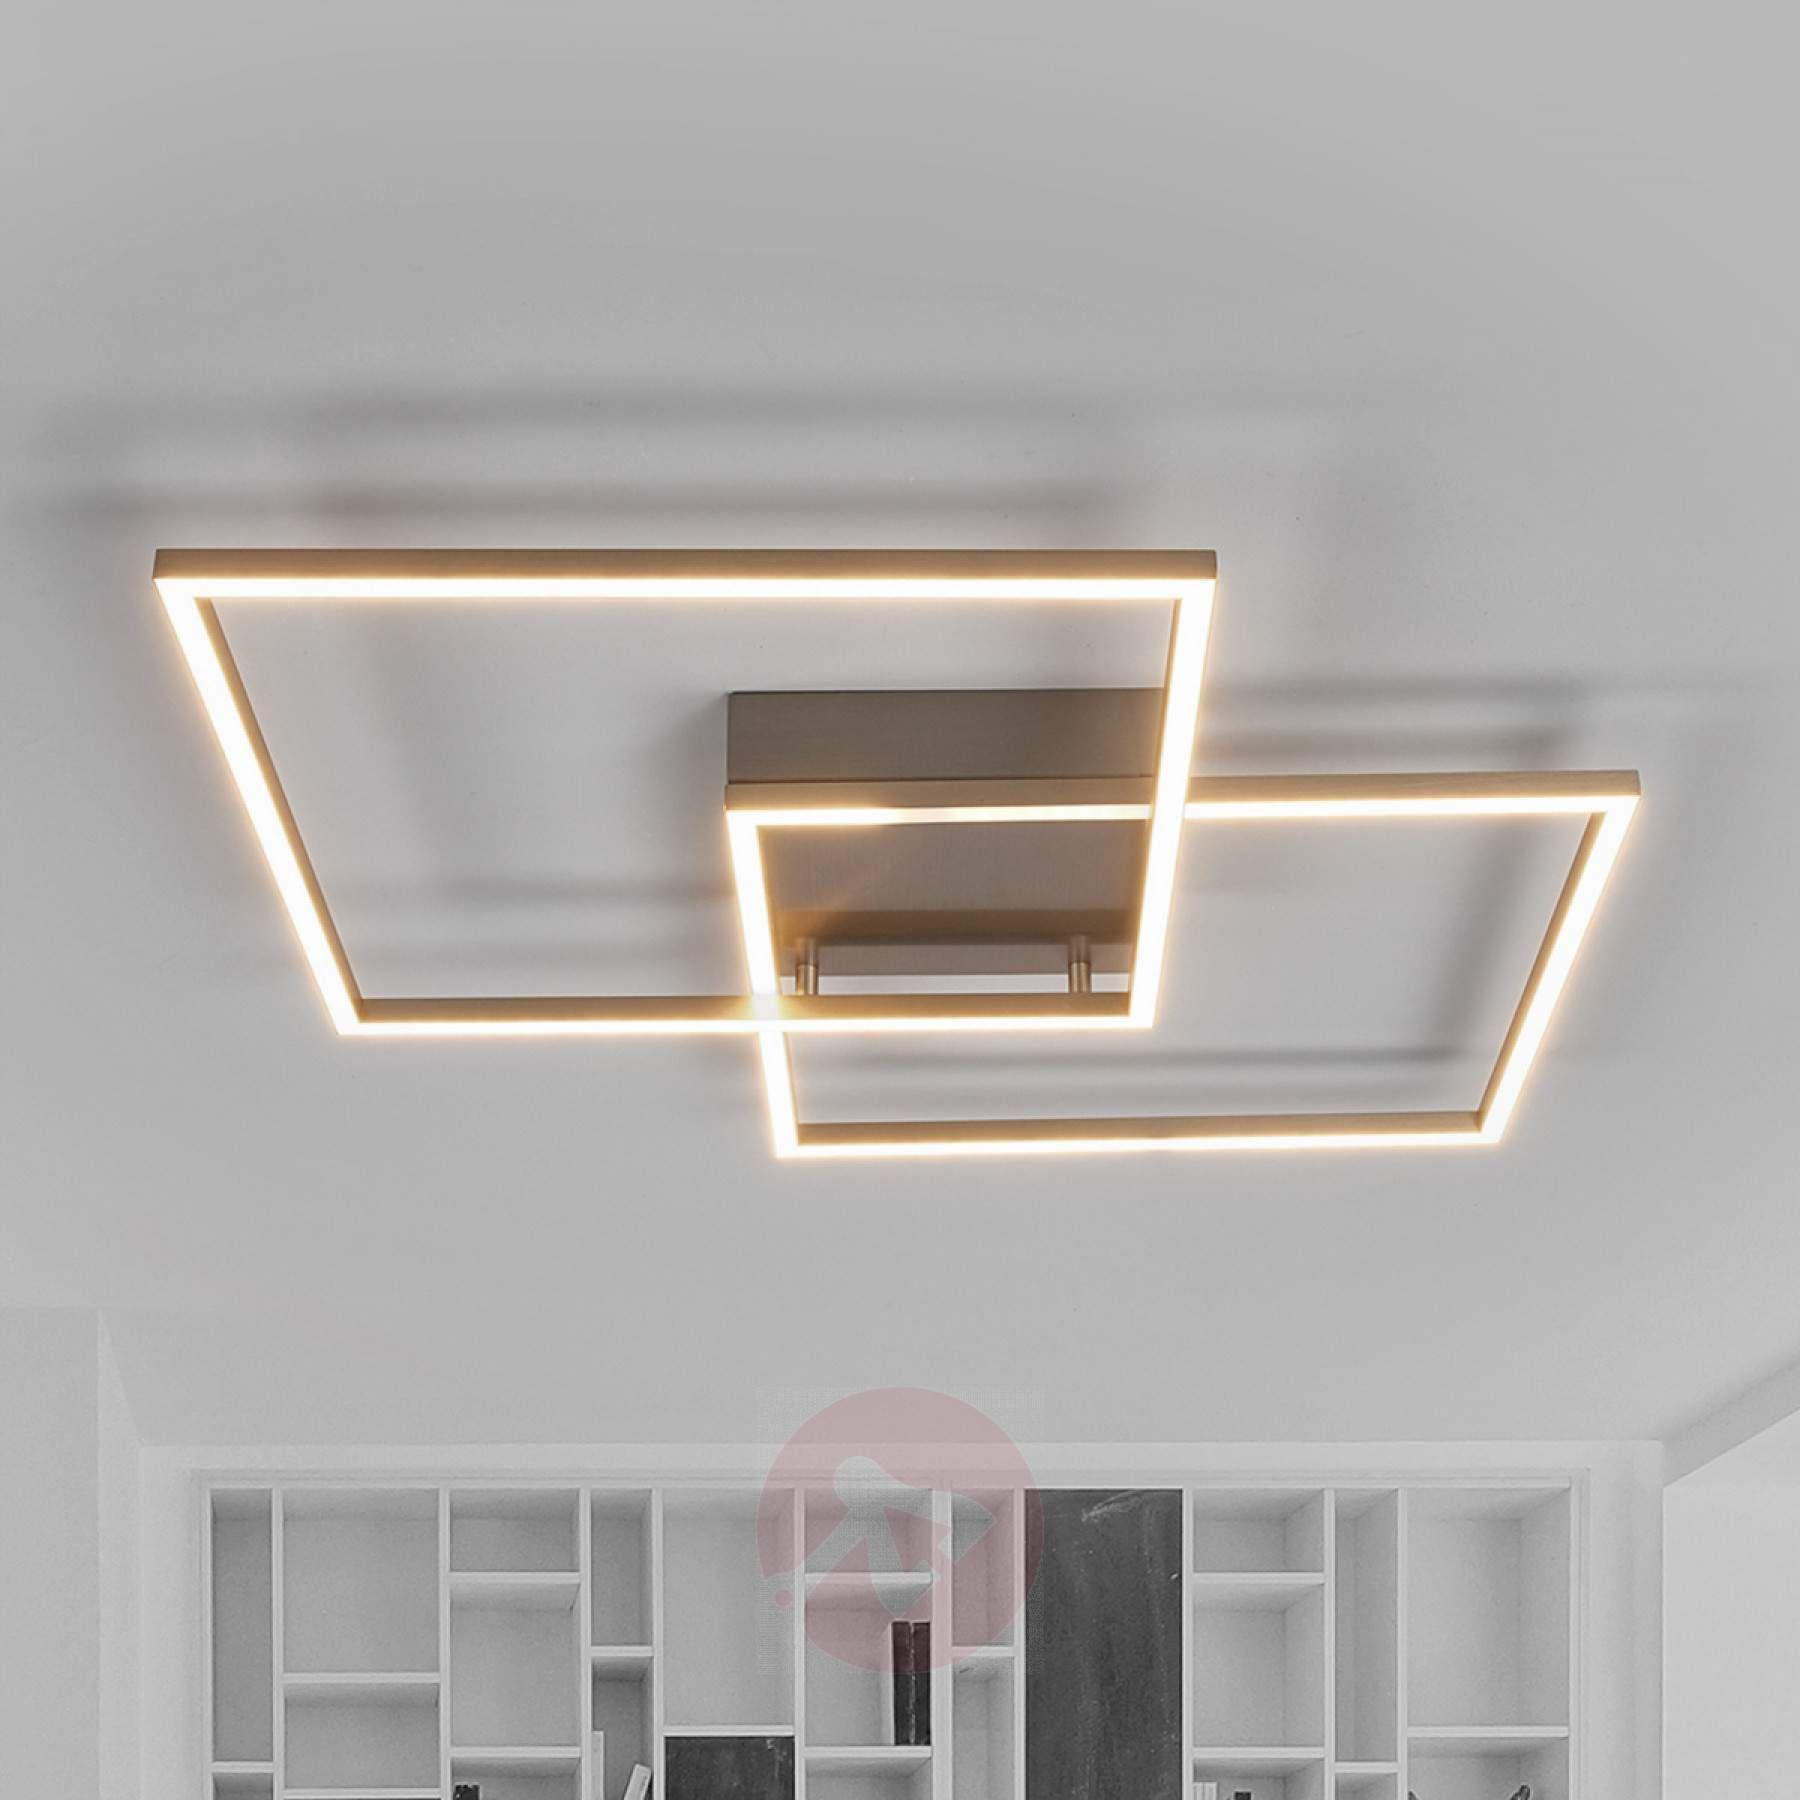 interessant gestaltete led deckenlampe mirac kaufen in. Black Bedroom Furniture Sets. Home Design Ideas